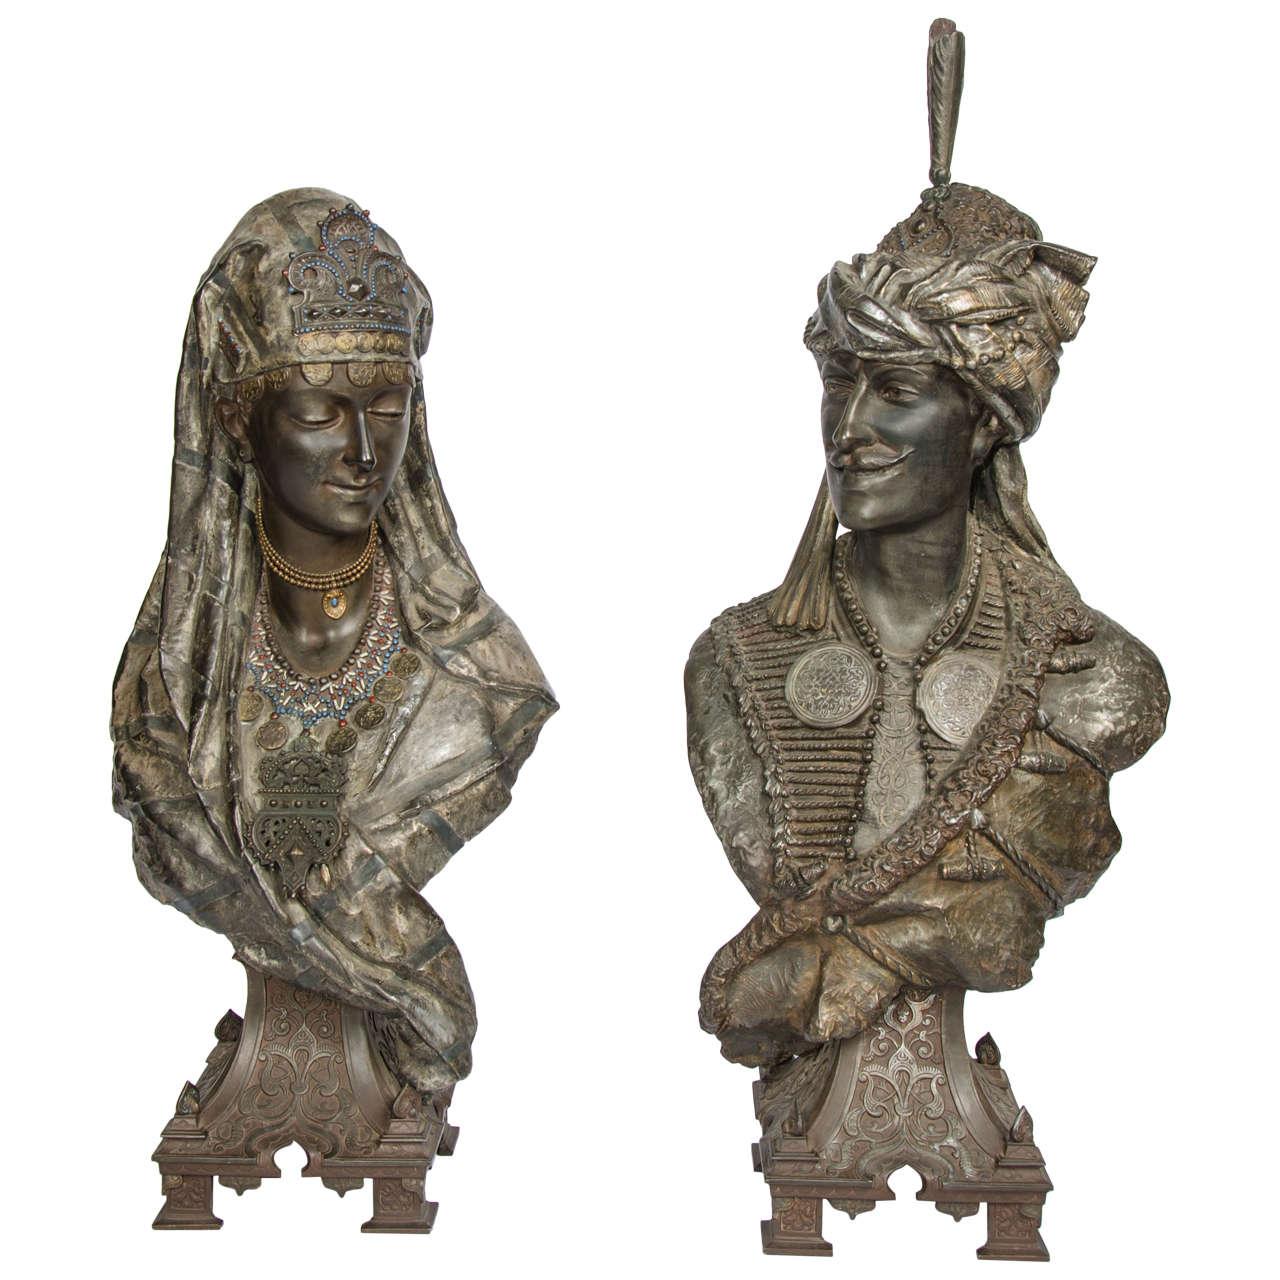 Pair of 19th Century bronzed Arab Busts